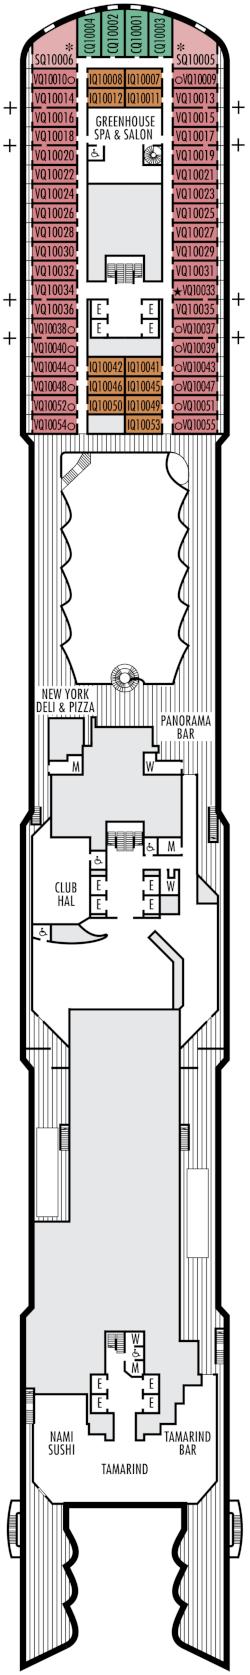 Nieuw Statendam Panorama Deck Deck Plan